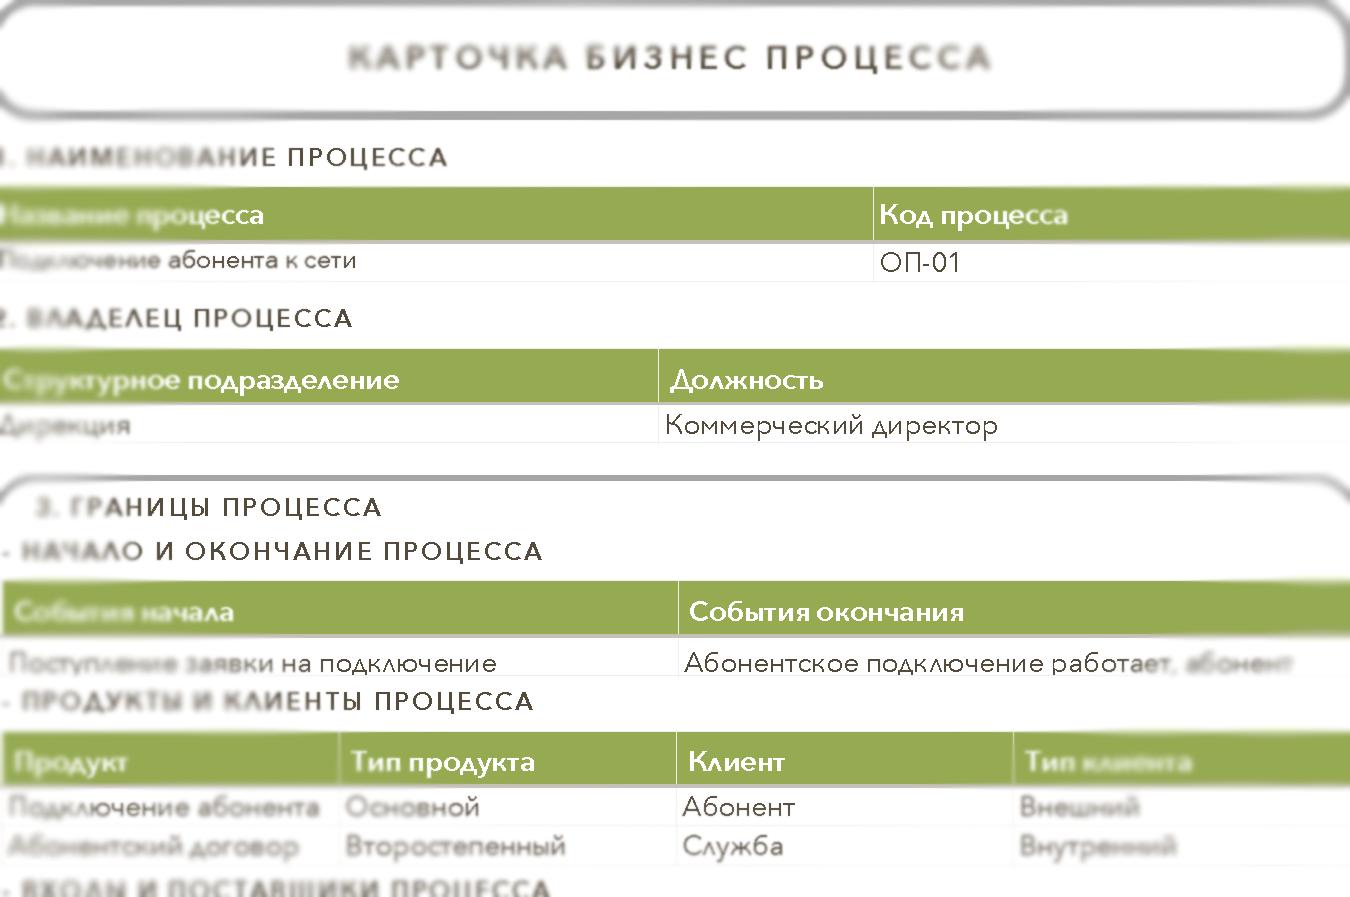 Образец карточки бизнес процесса